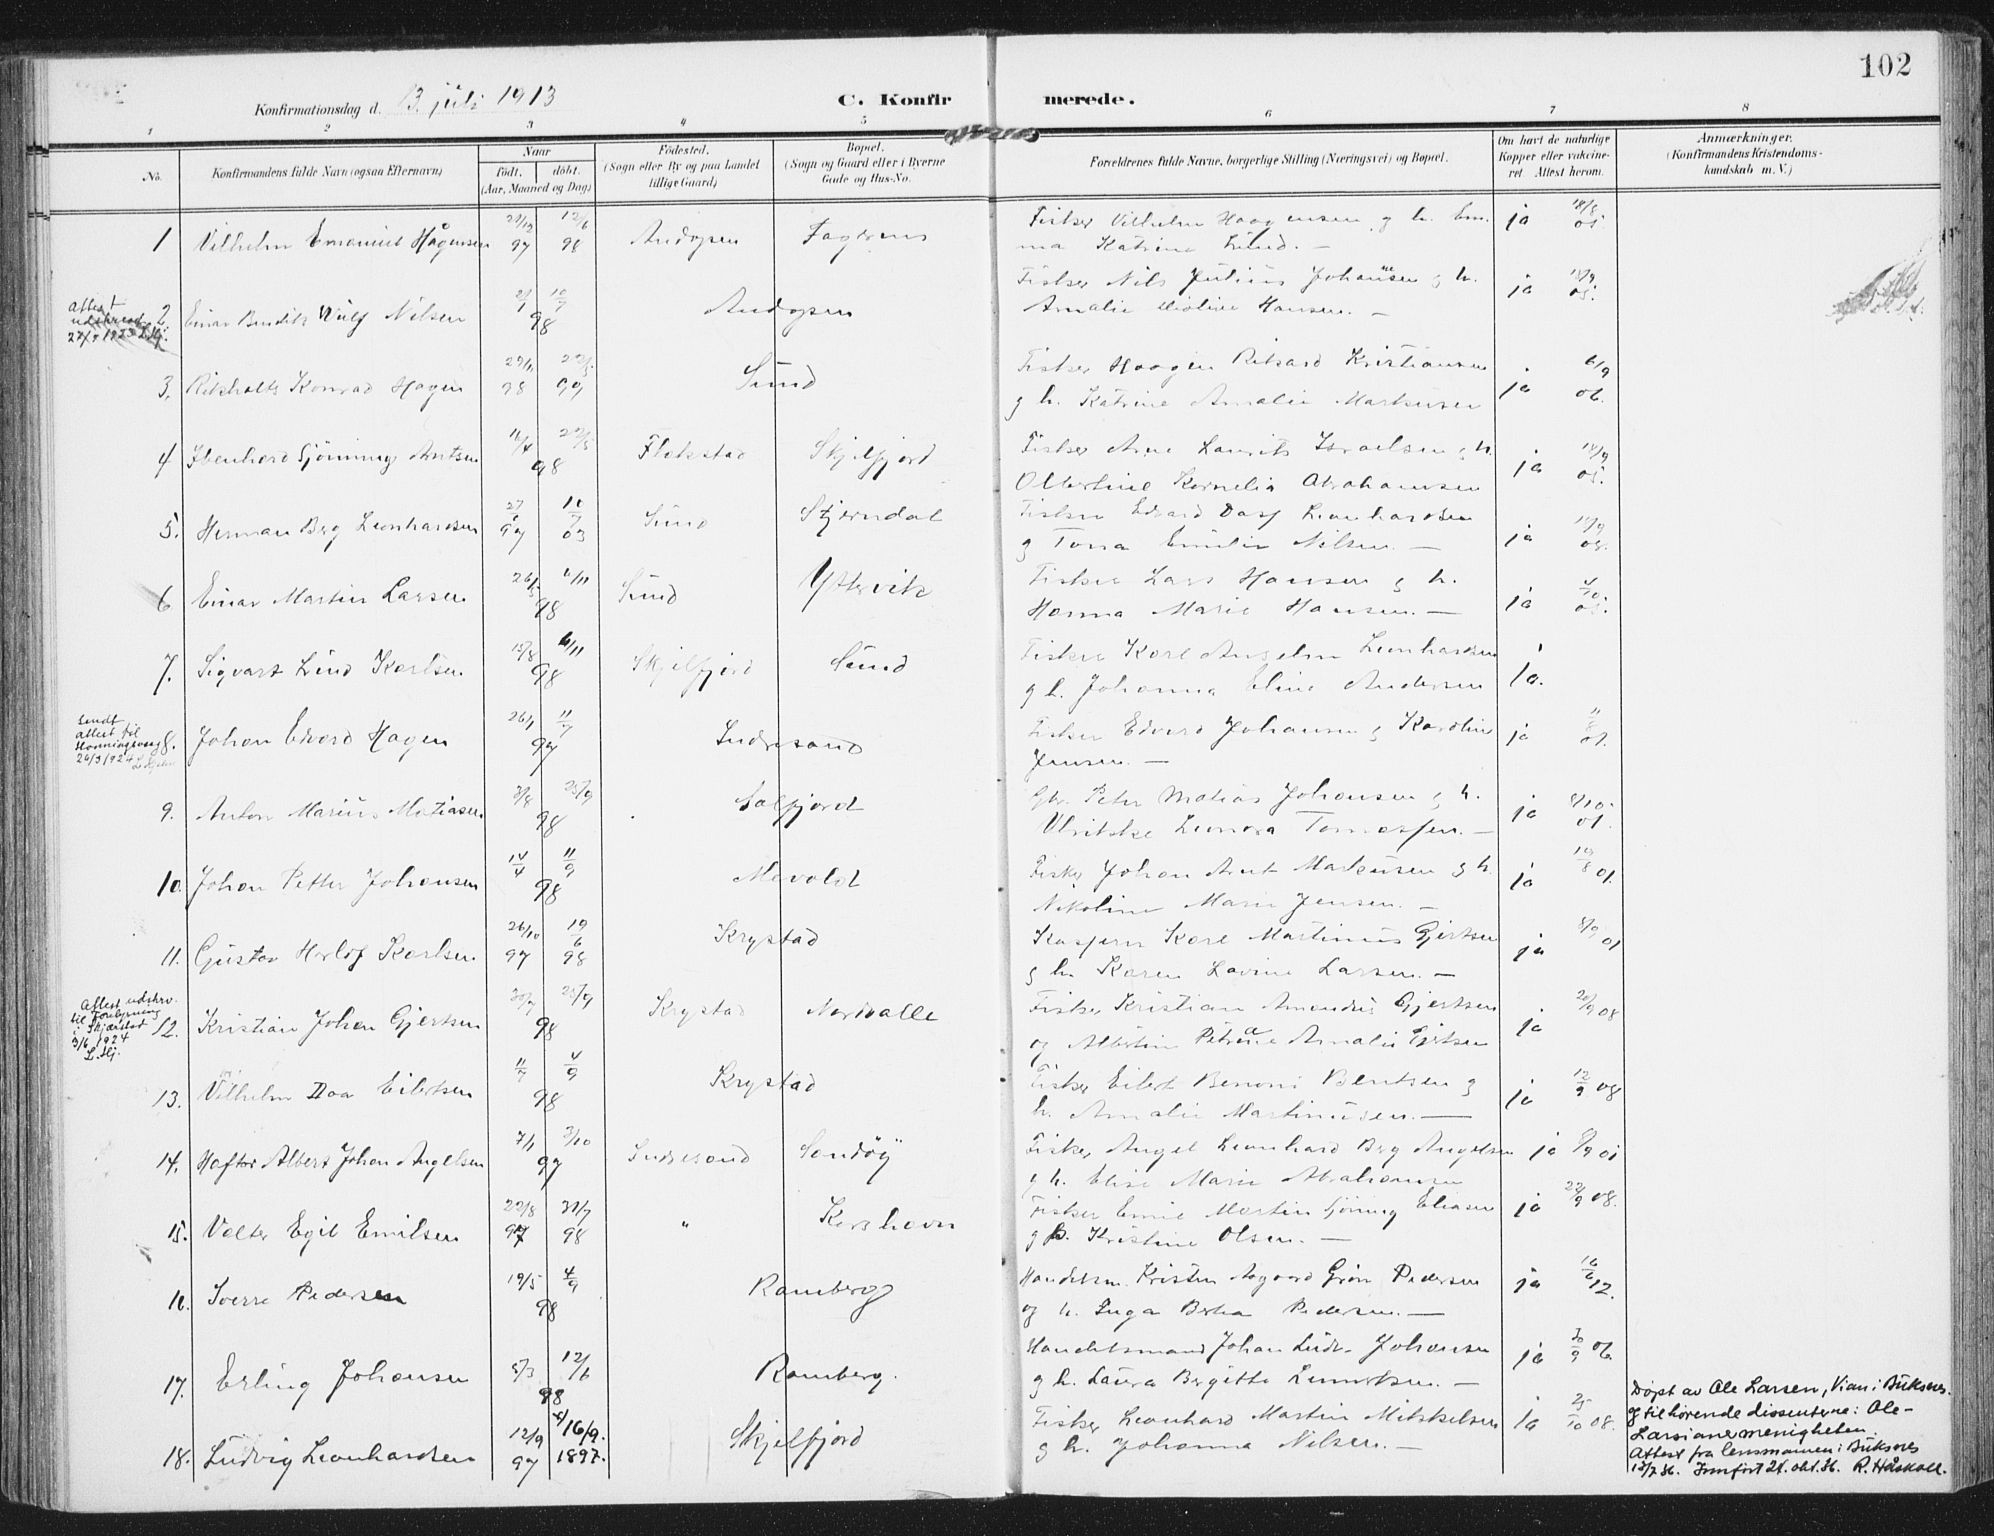 SAT, Ministerialprotokoller, klokkerbøker og fødselsregistre - Nordland, 885/L1206: Ministerialbok nr. 885A07, 1905-1915, s. 102